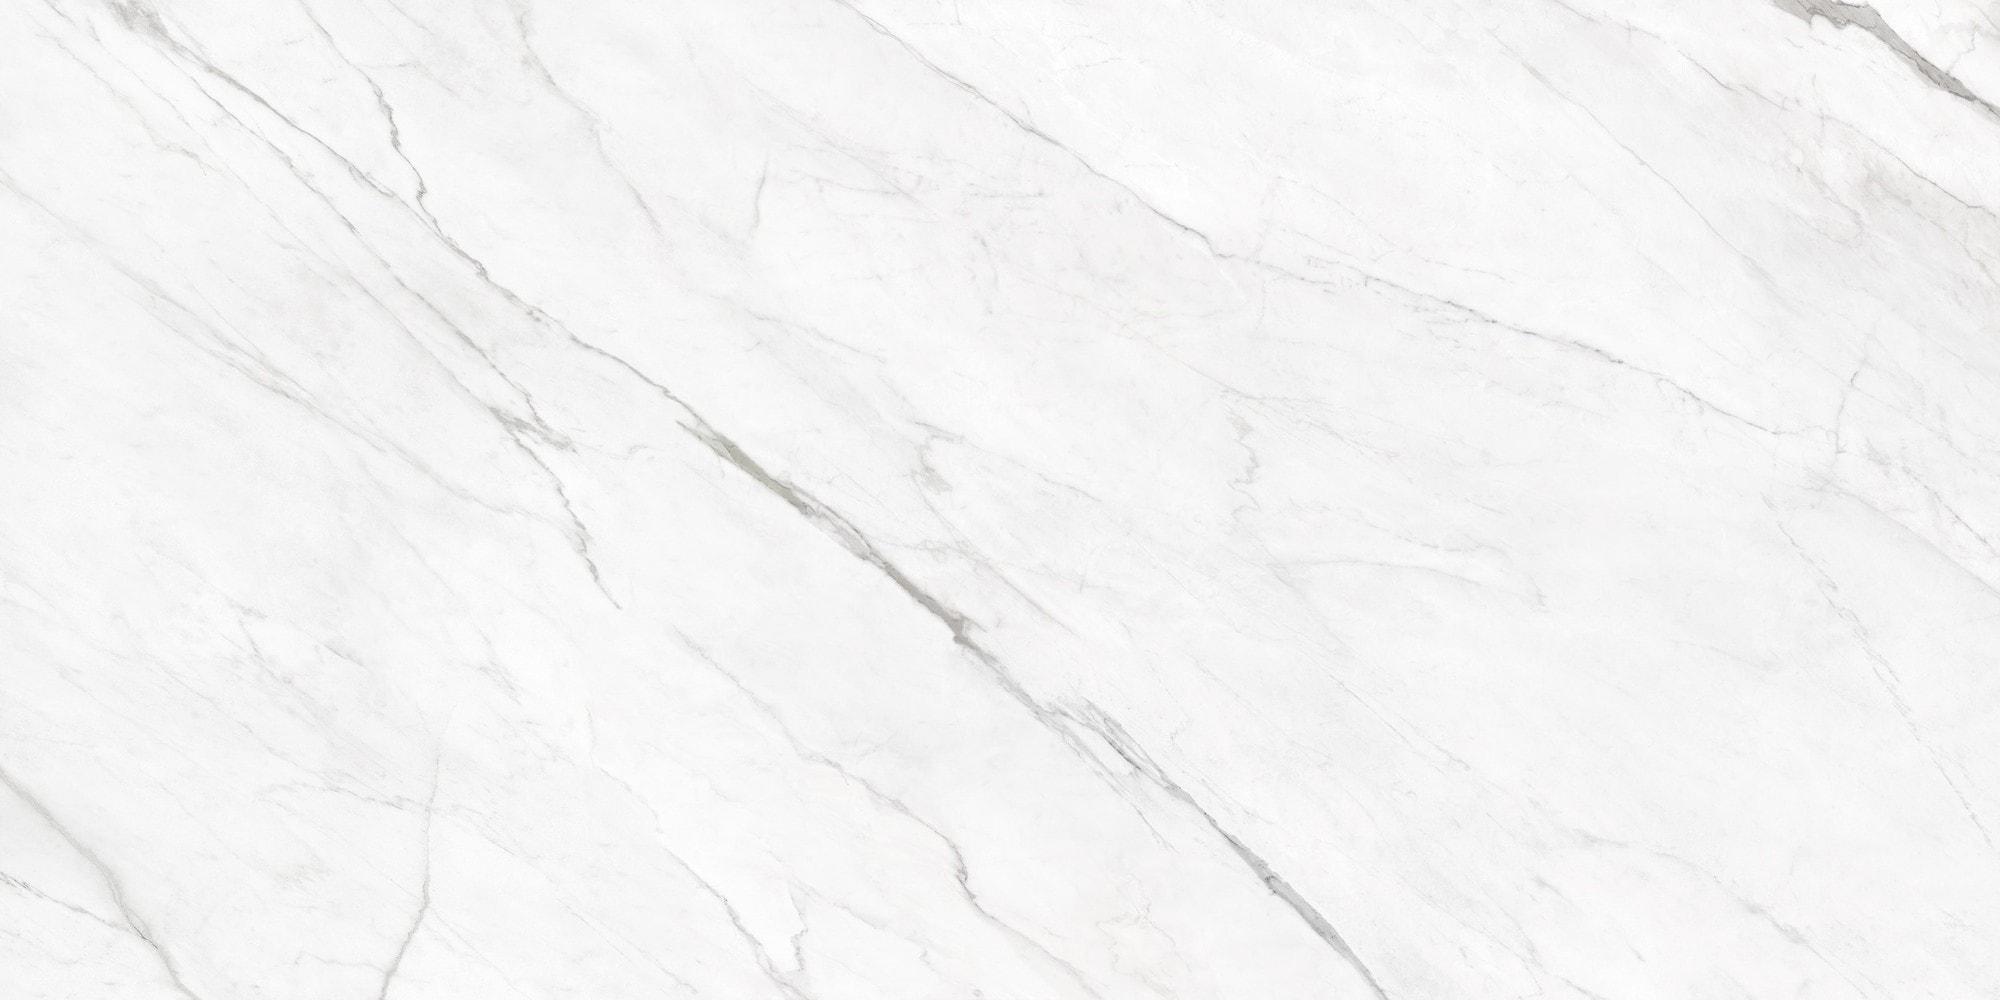 Płytka podłogowa Ultime Cerrad Statuario white poler 162x324cm 43896